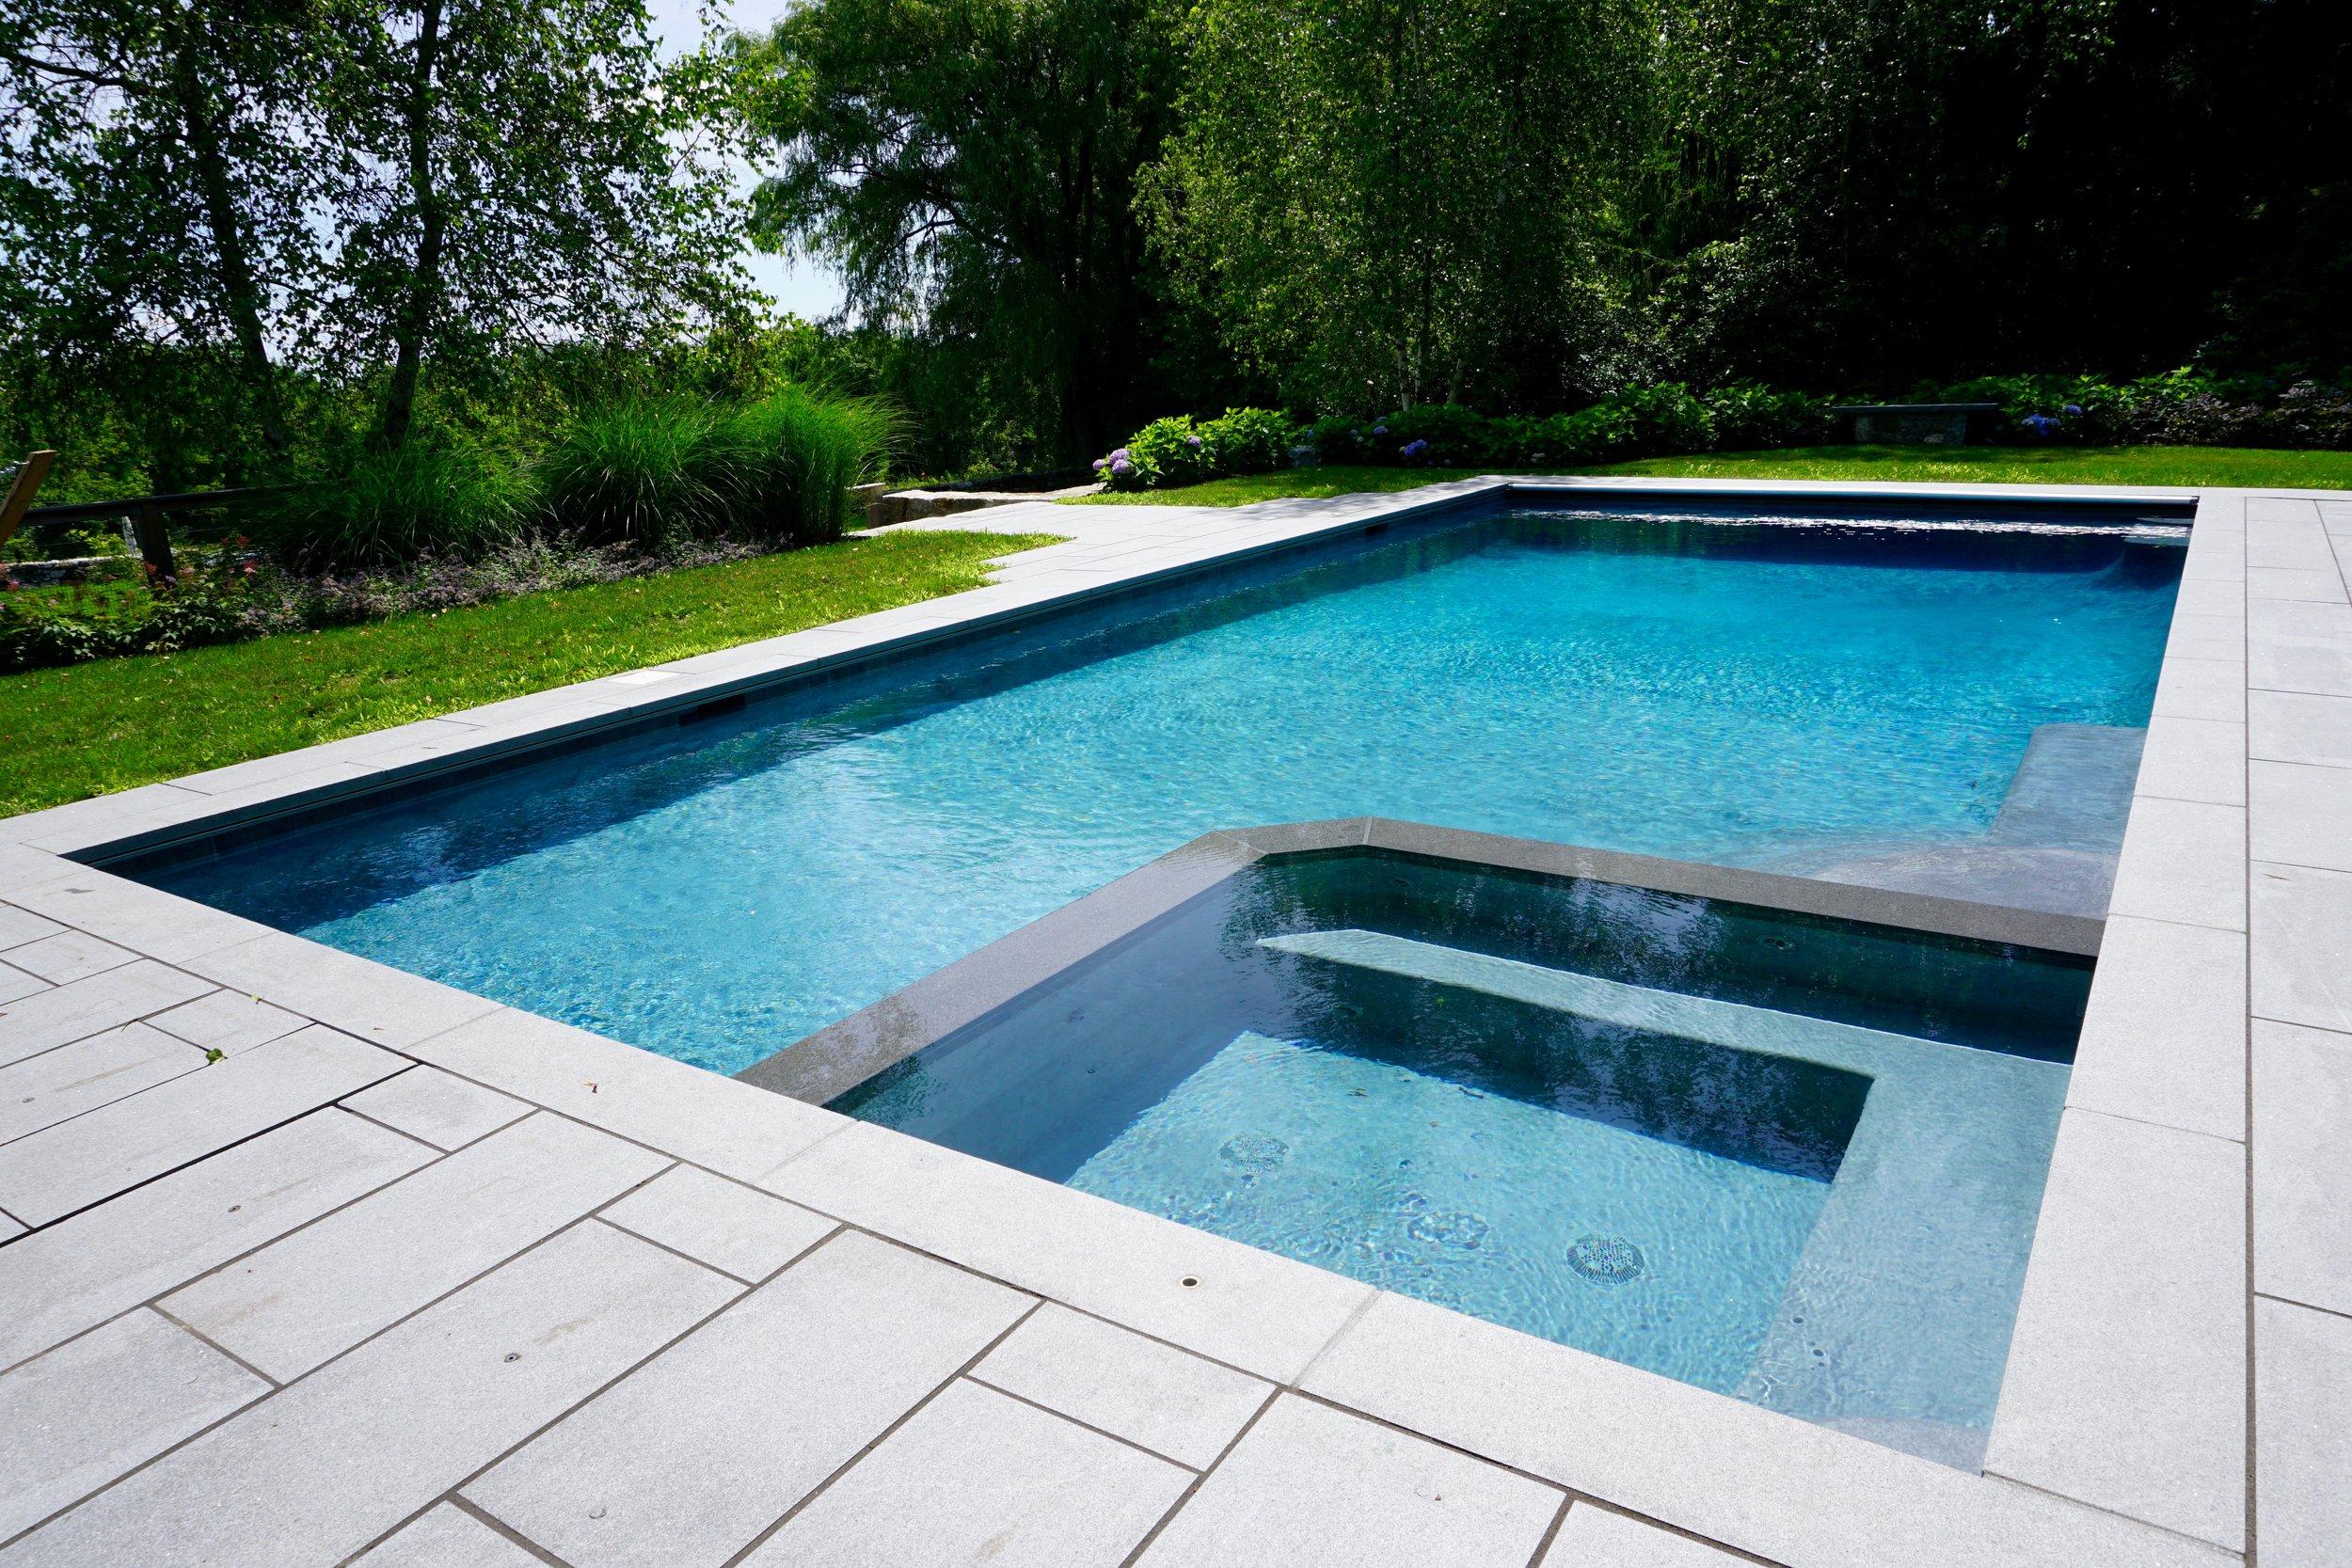 In-ground custom gunite pool with spa